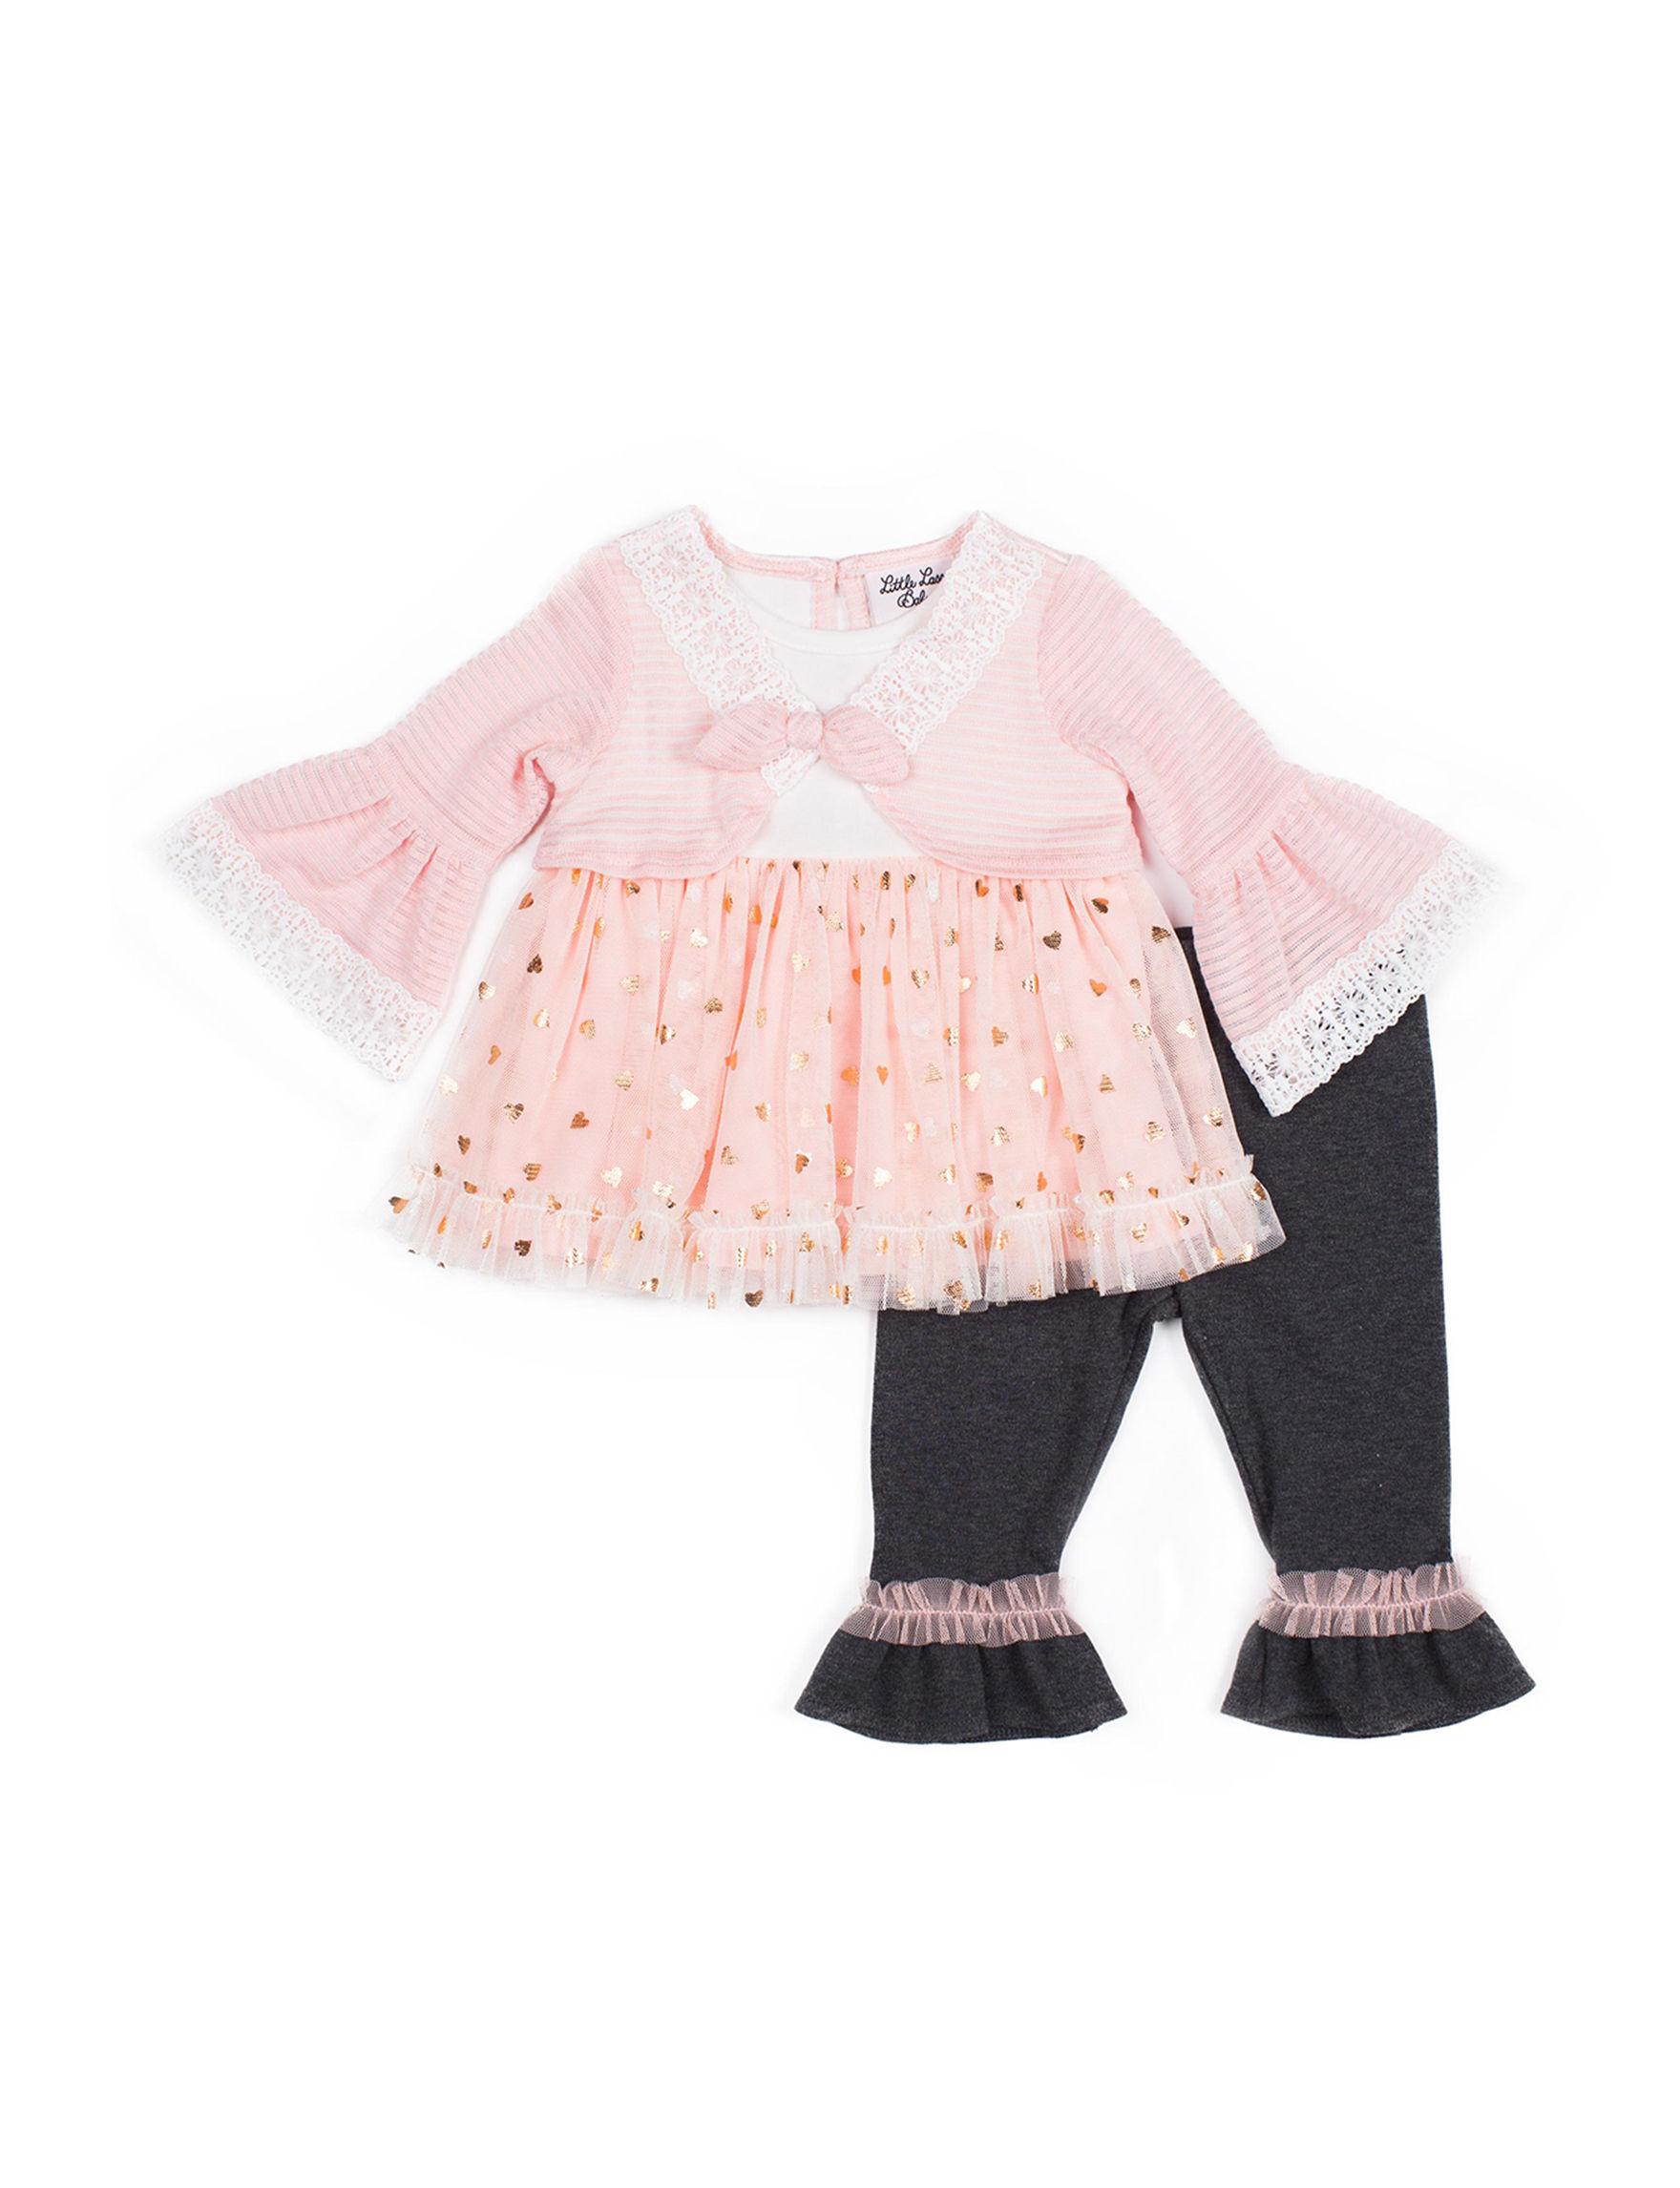 Little Lass Pink / Black